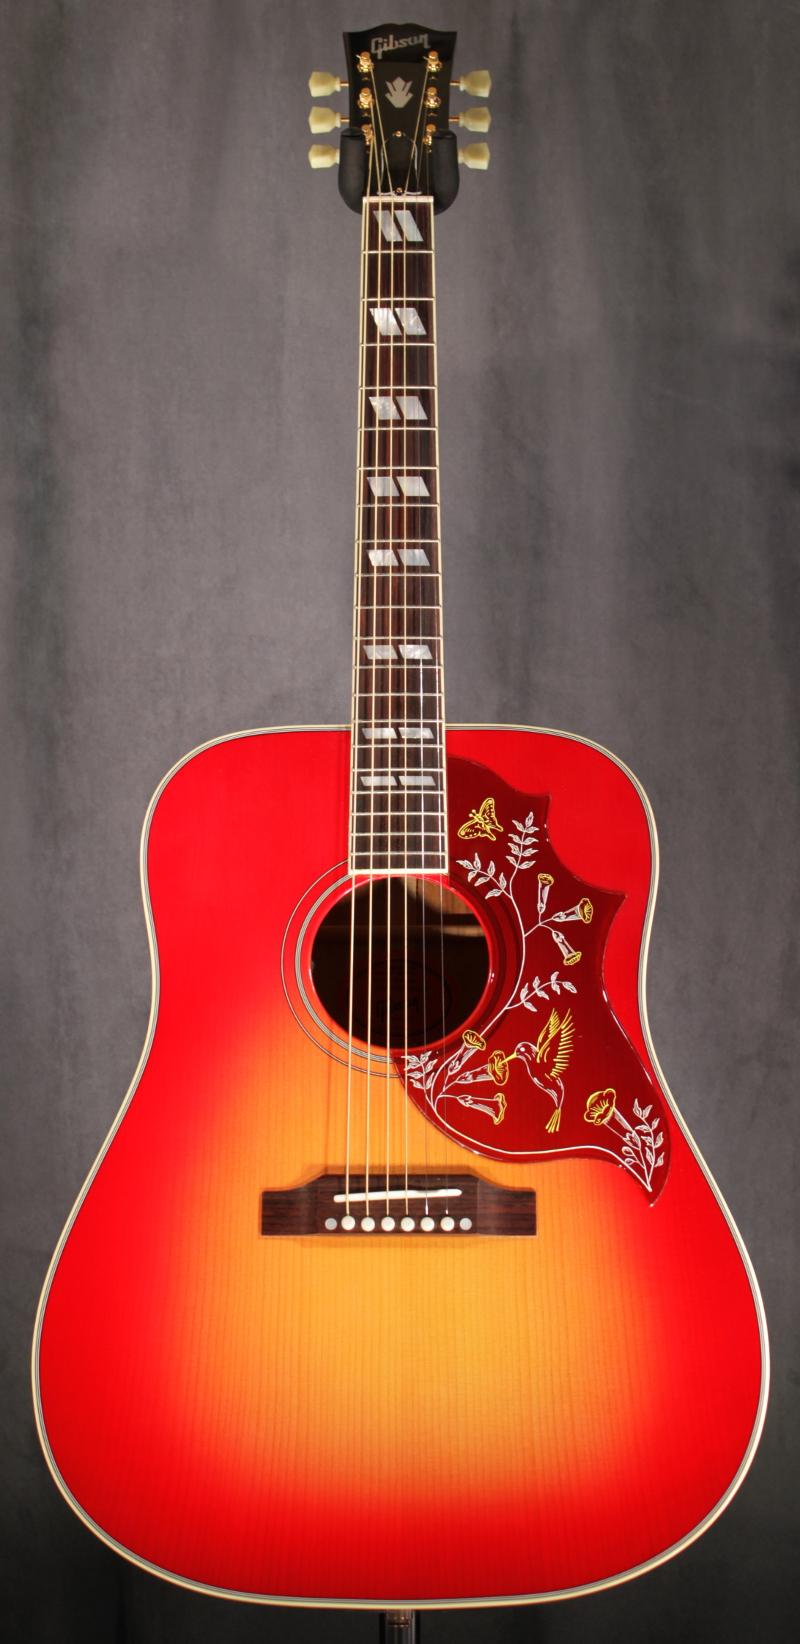 gibson hummingbird ltd edition red spruce long mcquade musical instruments. Black Bedroom Furniture Sets. Home Design Ideas